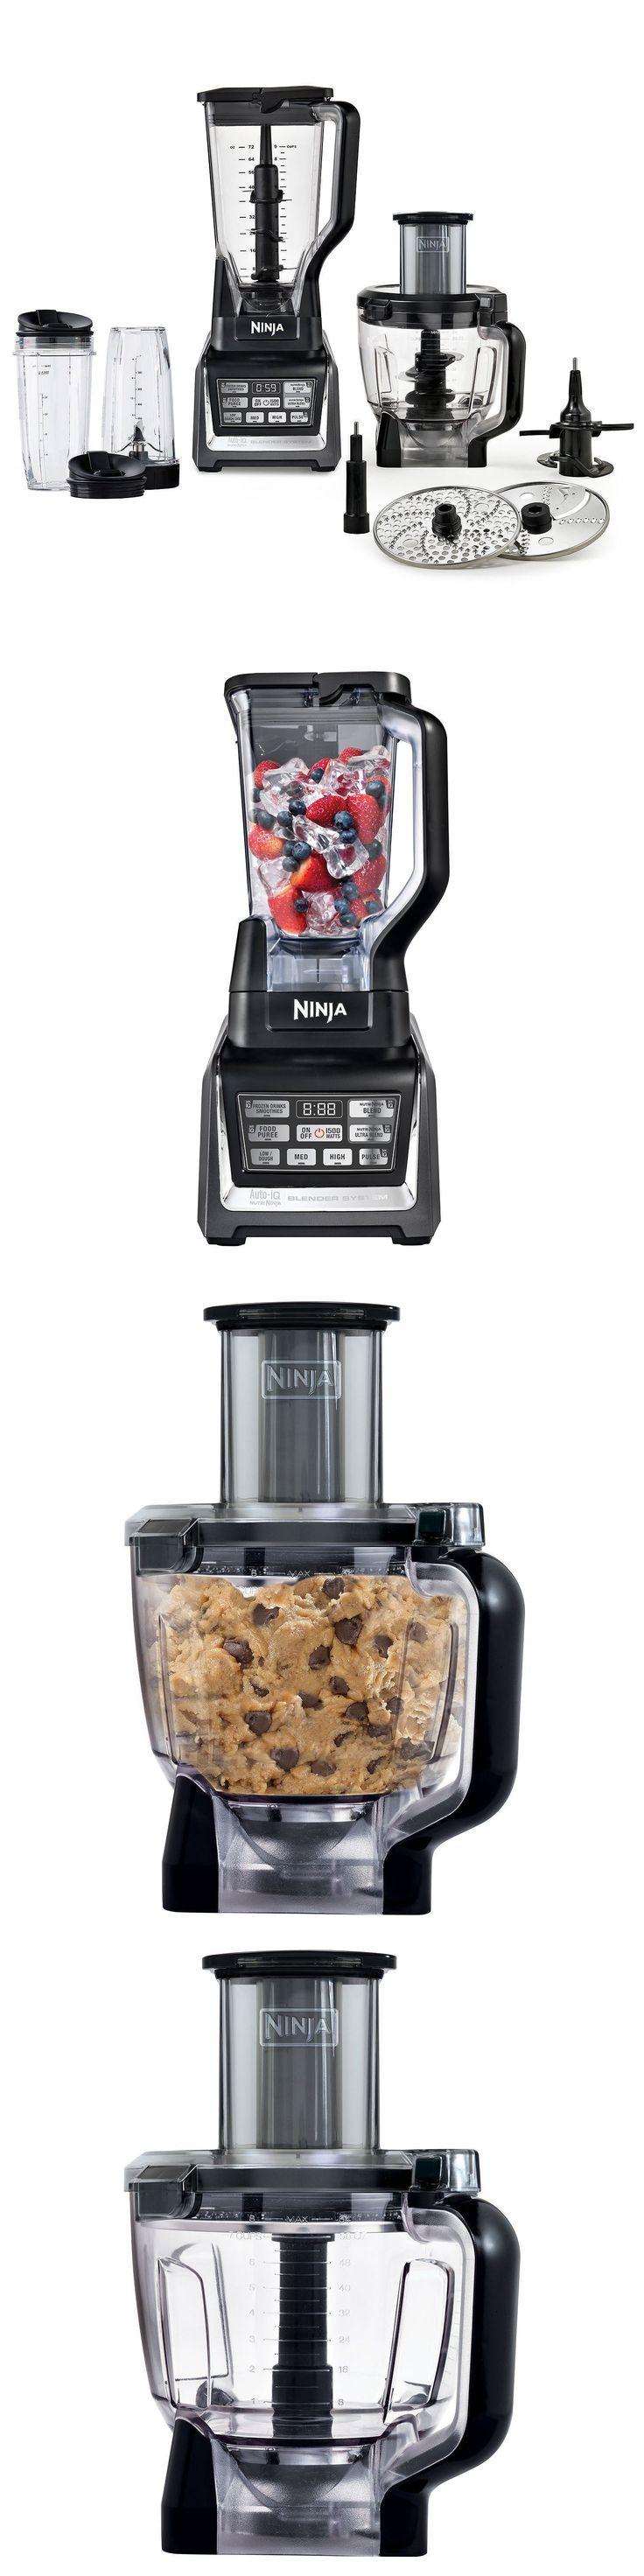 Ninja mega kitchen system 1500w 2hp food processor blender bl773co - Small Kitchen Appliances Nutri Ninja 1500w Auto Iq Bl681a Blender Food Processor Juicer 2